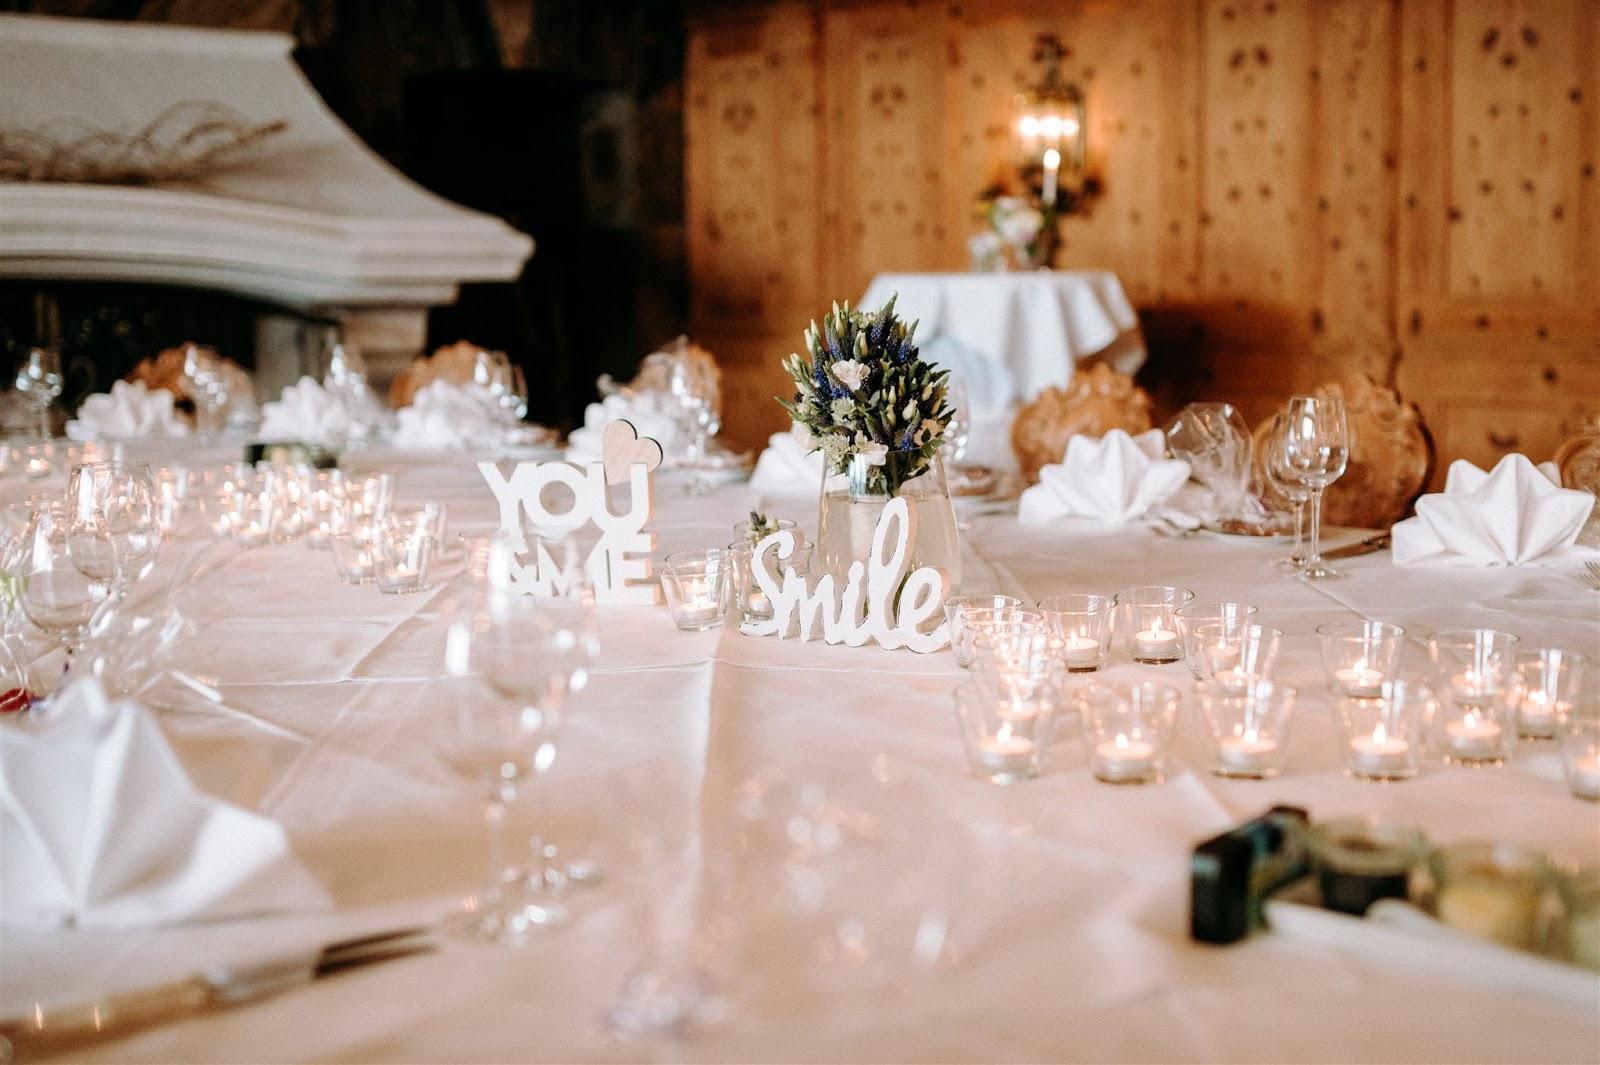 wedding table, Mountain wedding, Berghochzeit, destination wedding Bavaria, Wallgau, photo credit Magnus Winterholler Gipfelliebe, wedding planner Uschi Glas 4 weddings & events